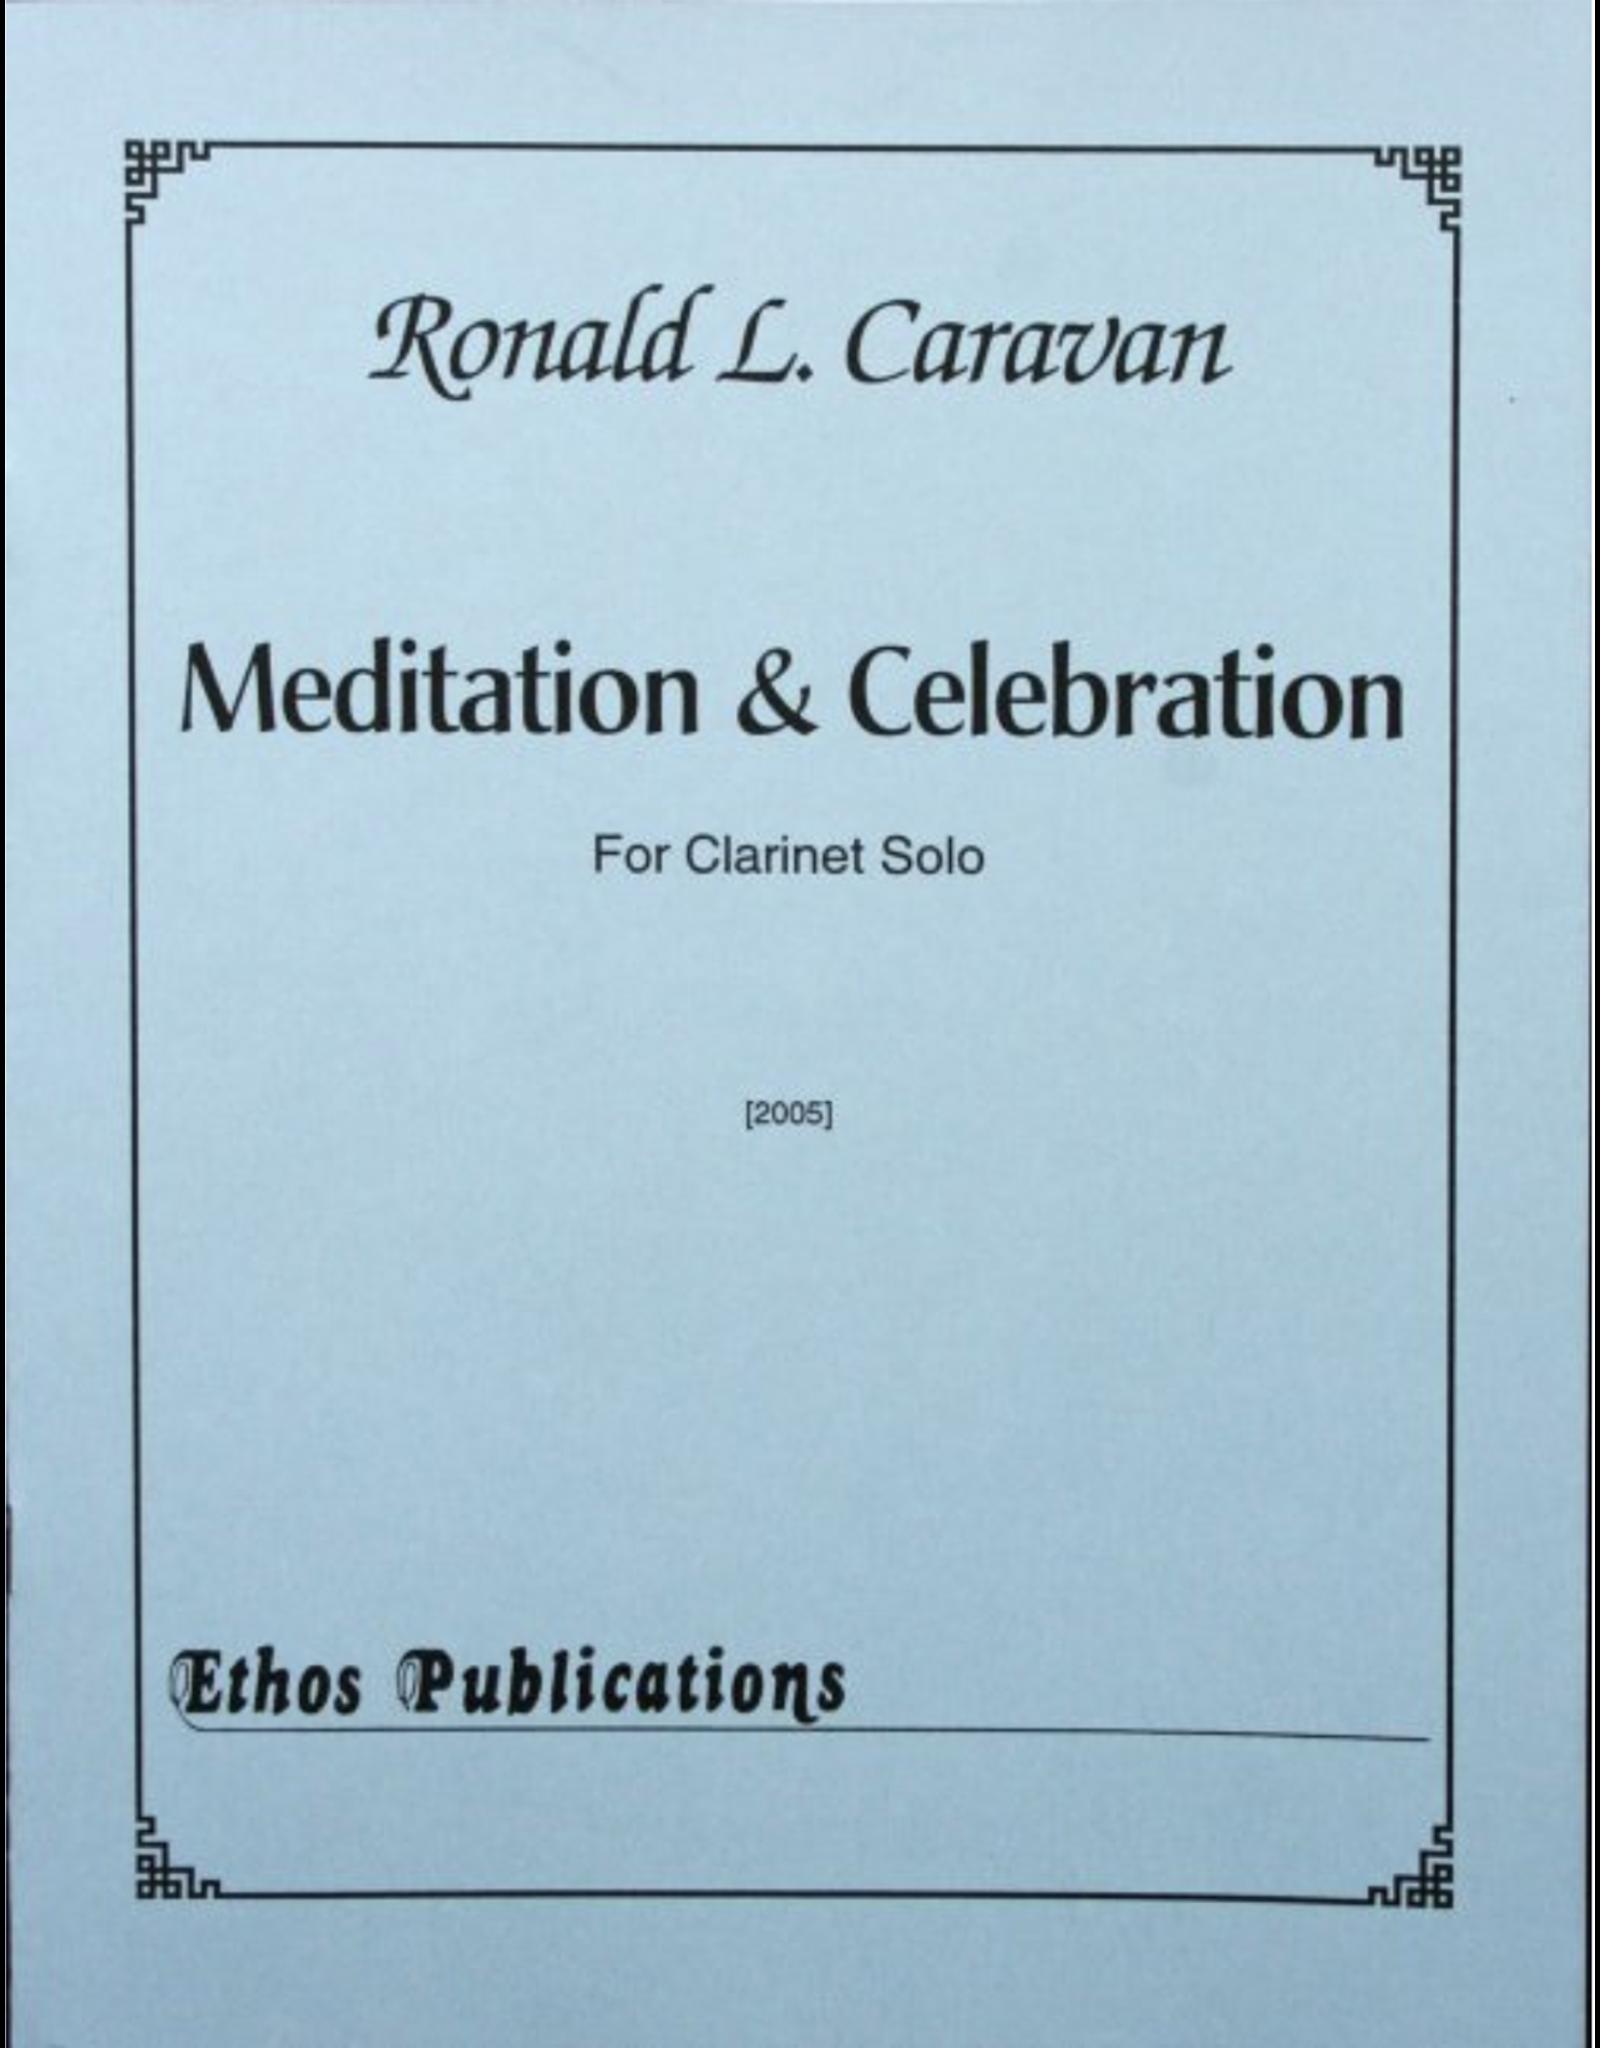 Ethos Publications Caravan - Meditation & Celebration Clarinet Solo